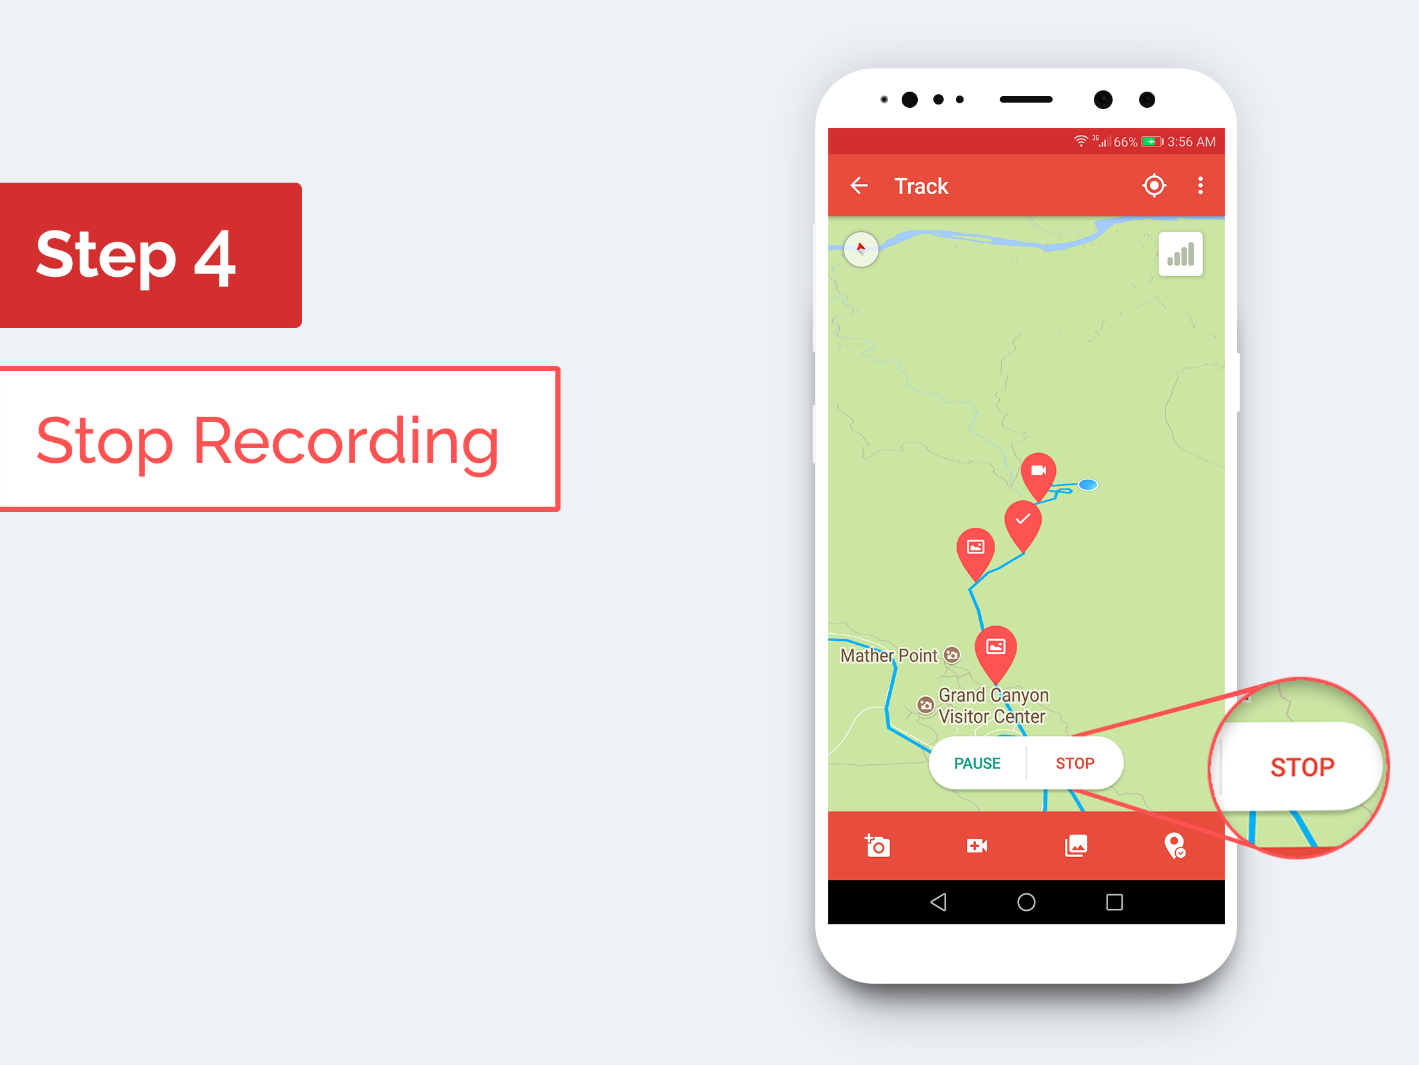 Traverous - Step 4: Stop Recording